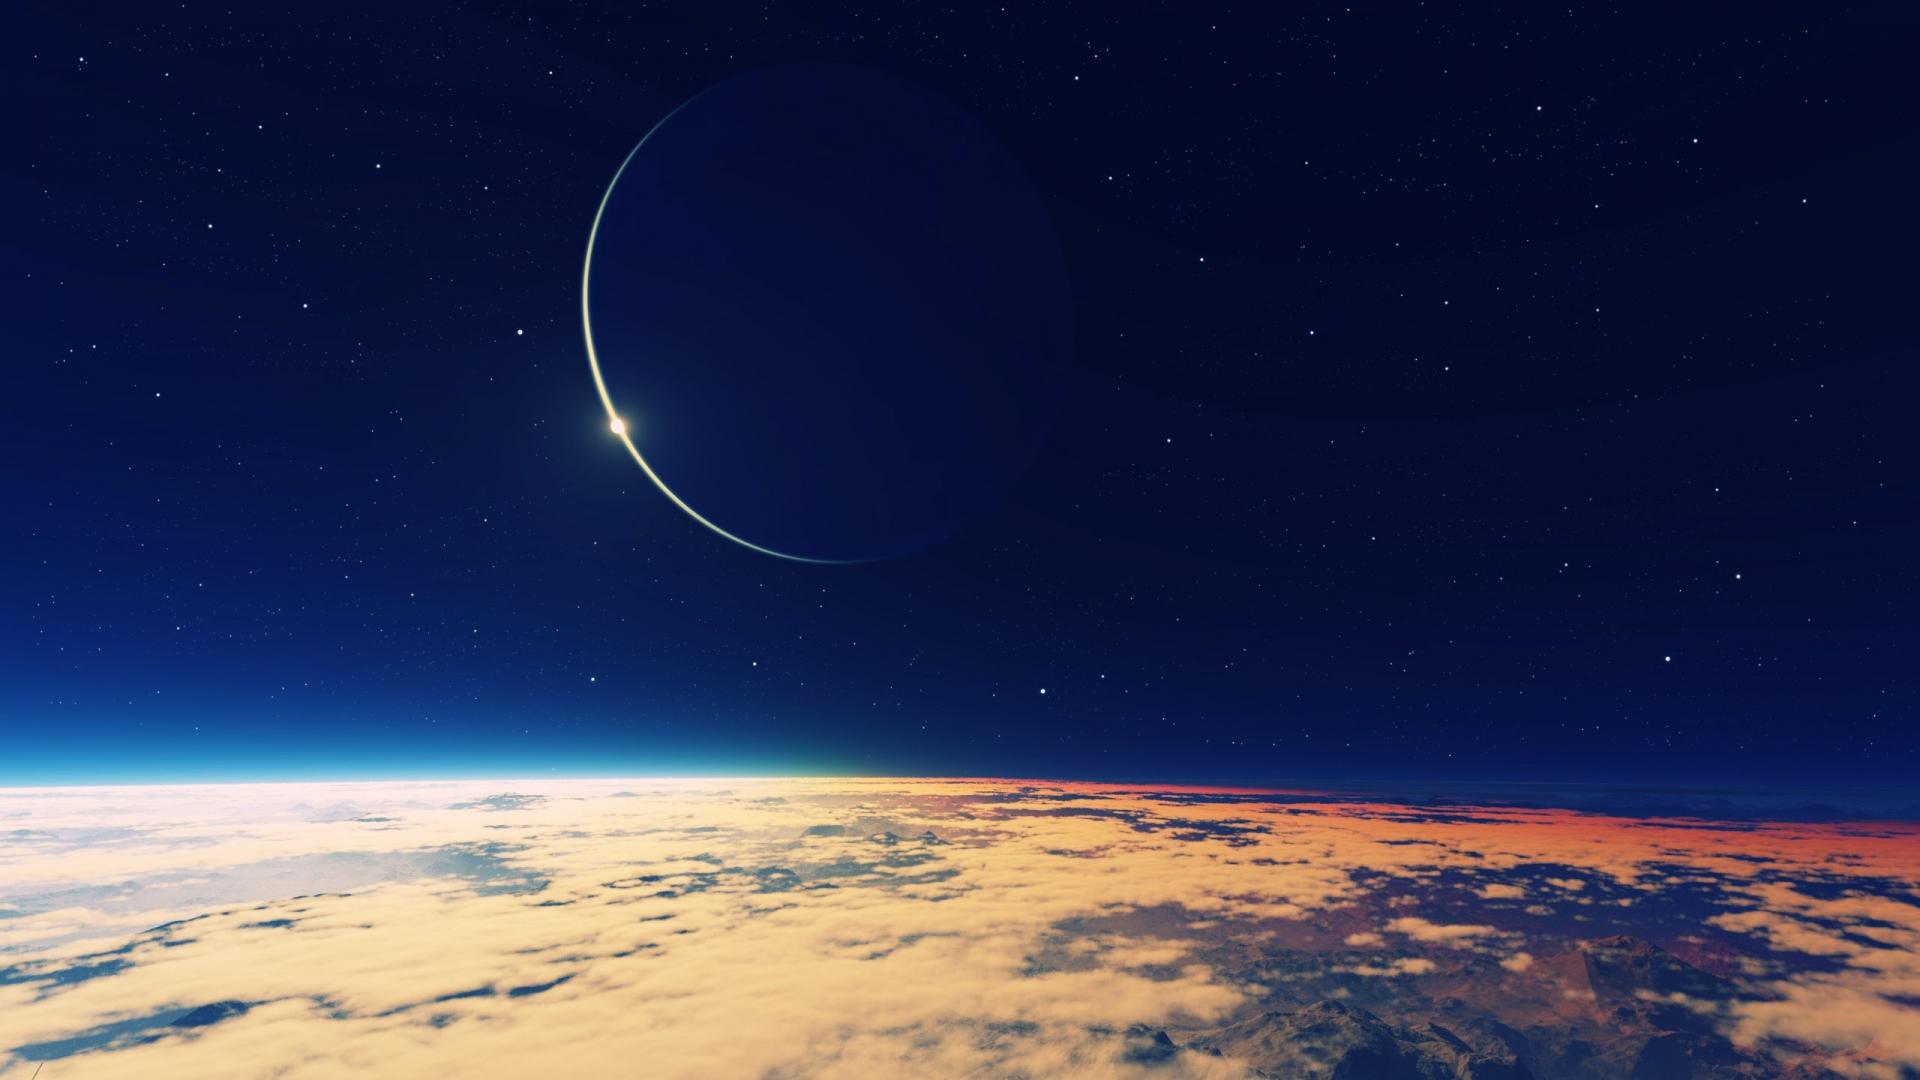 space wallpaper 47117